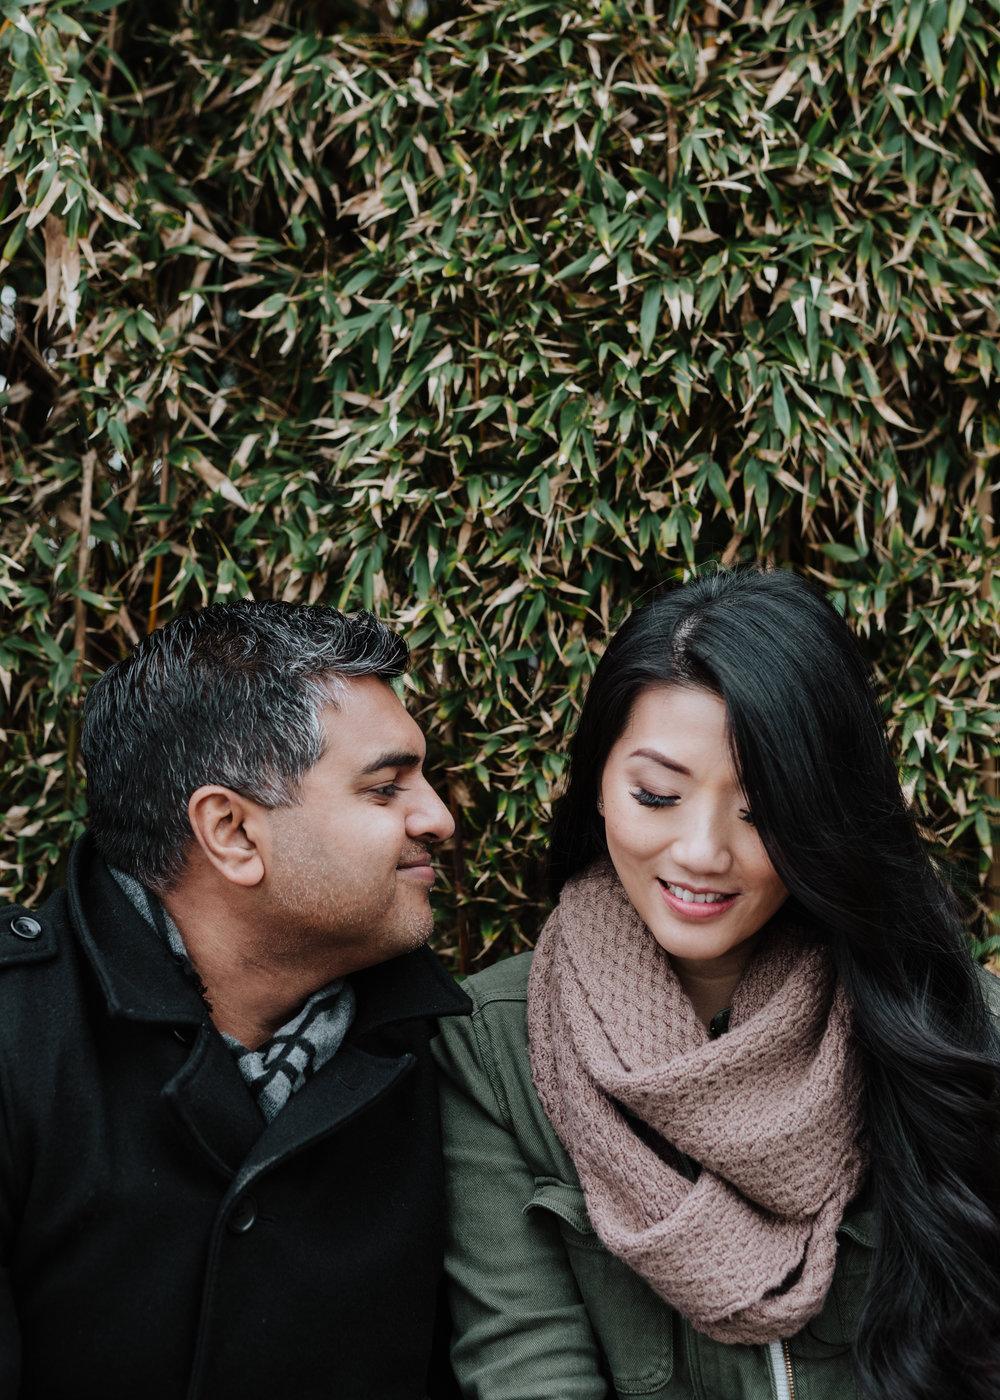 HeraStudios_Selects_Full_JuliaAndrew_Engagement-74.jpg